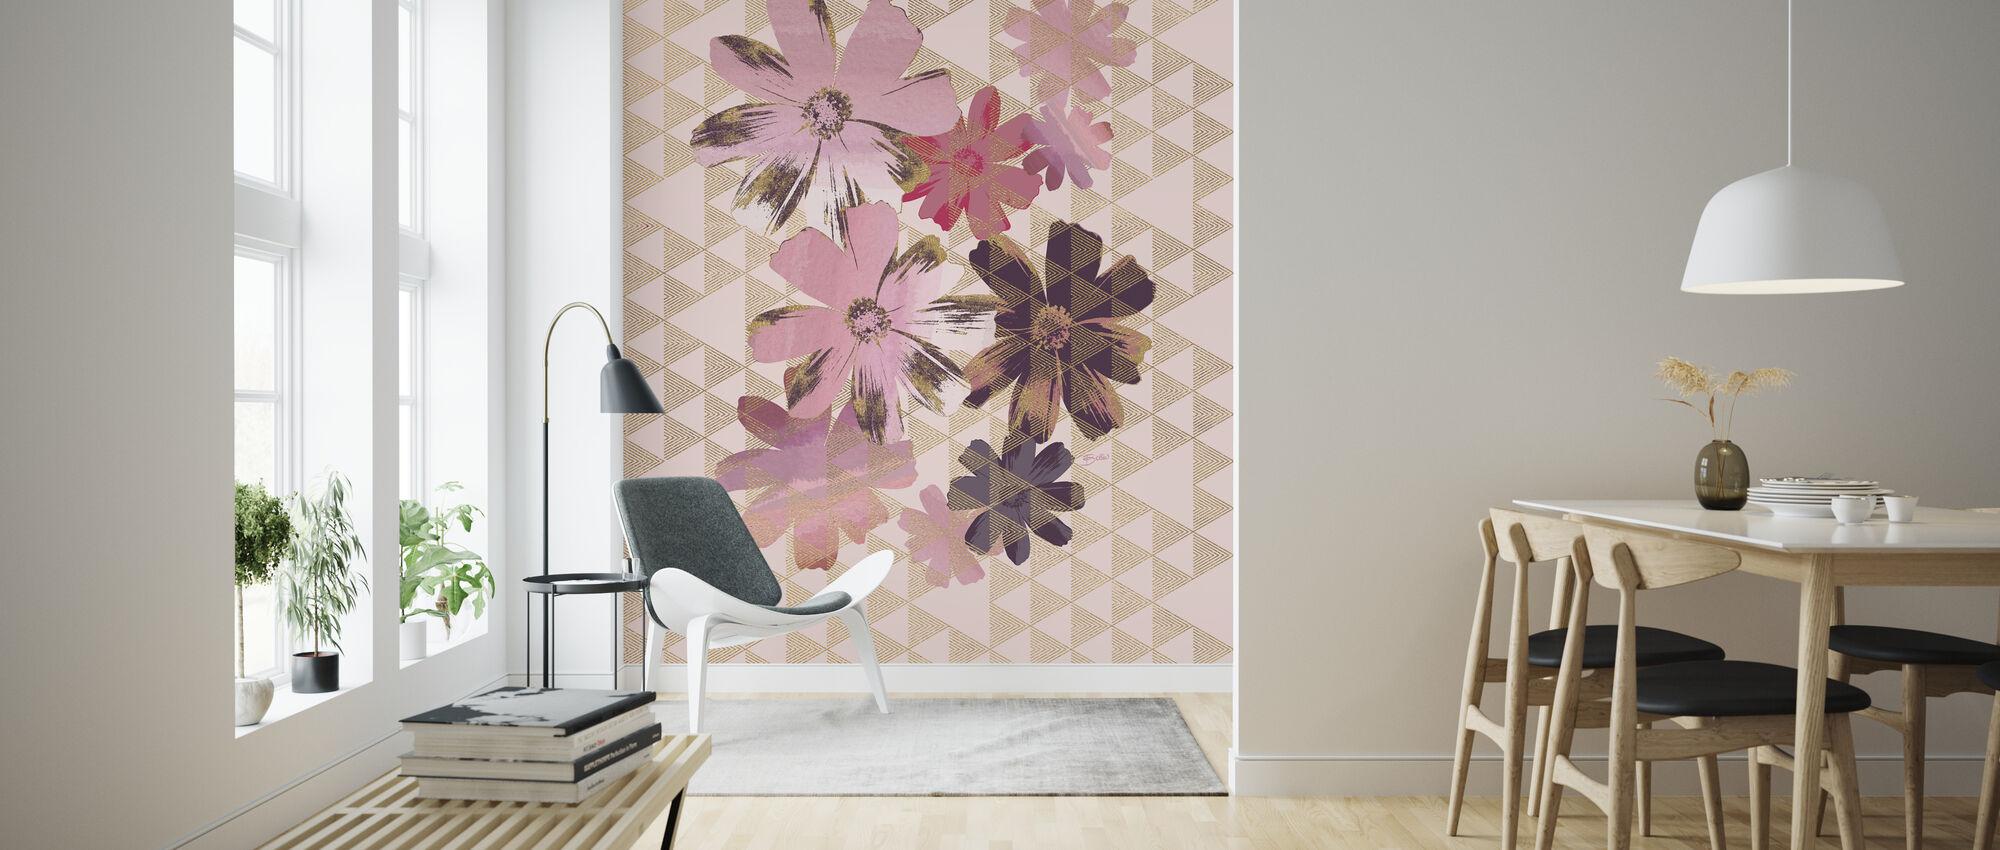 Kimono Daisies 1 - Wallpaper - Living Room